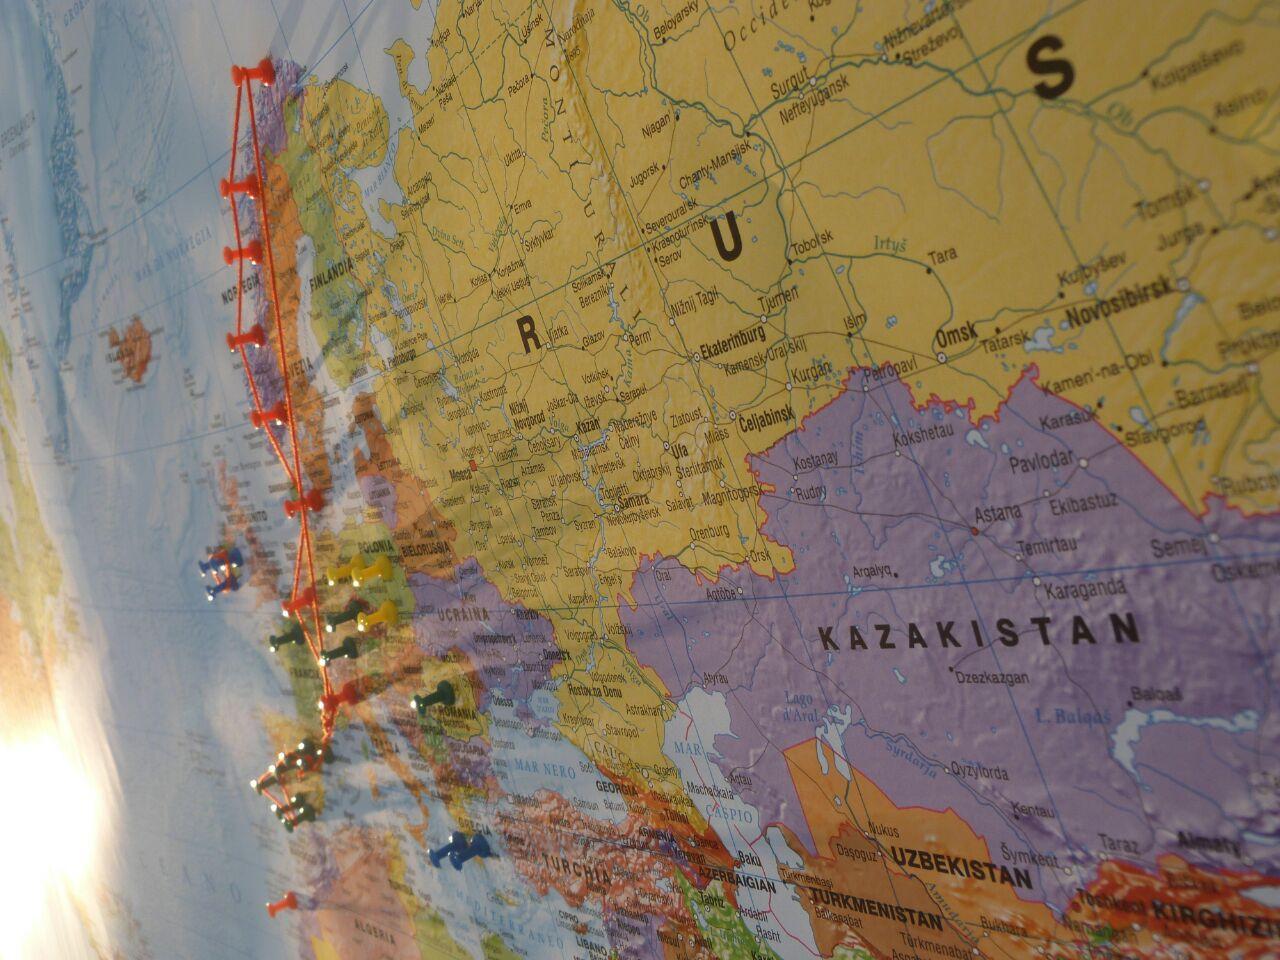 Diario di un nomade: Ritorno a casa – Dicembre 2016